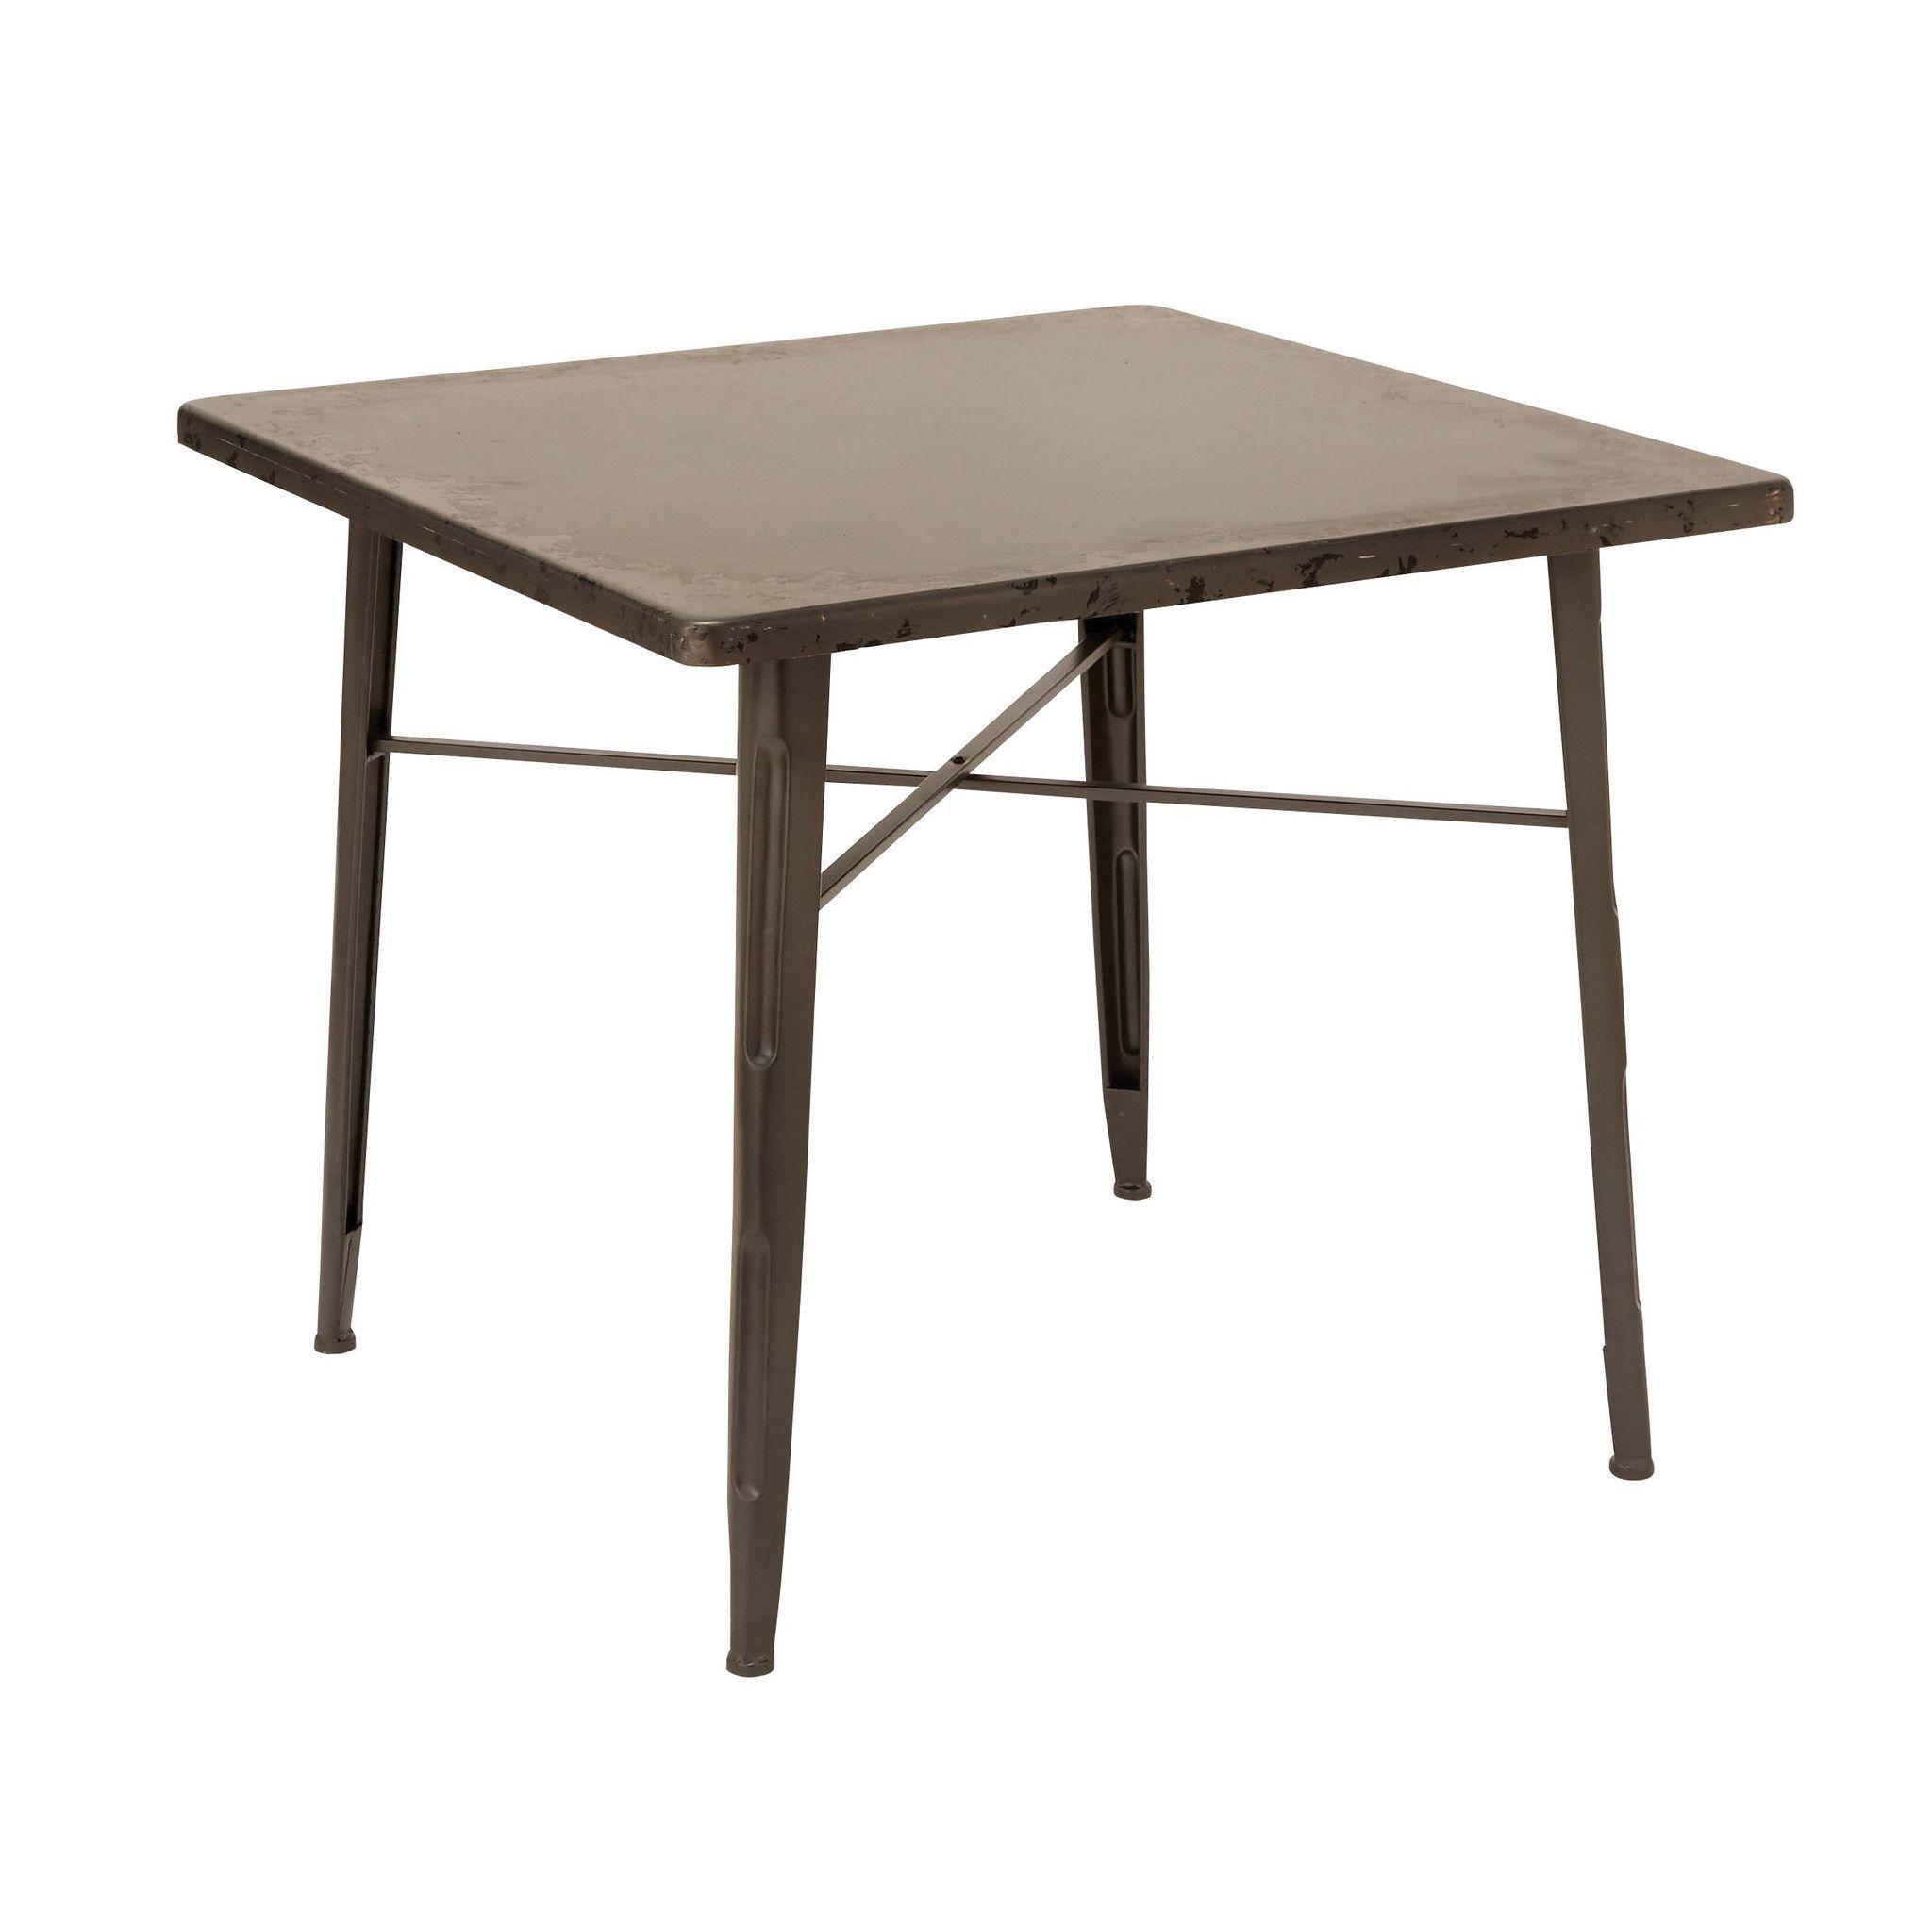 Ducar Cocktail Tables In Favorite Buy Wood Table Elegant Design In A Dark Brown Color At Harvey (View 16 of 20)